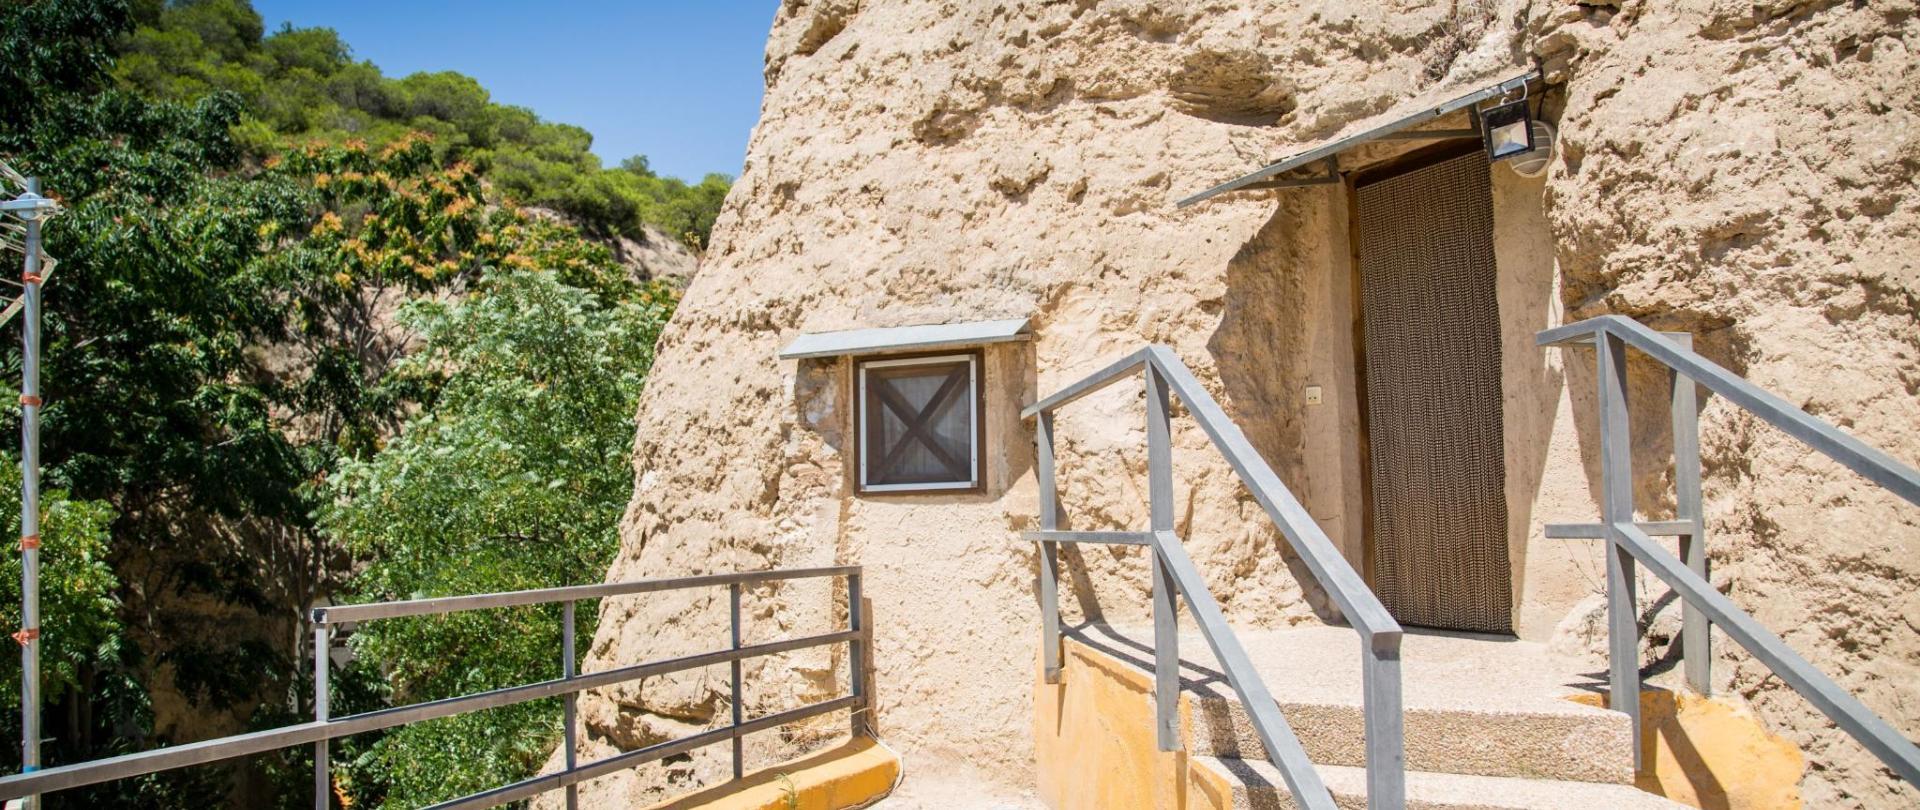 resized_2018_01 Exterior cuevas de Valtierra-55.jpg